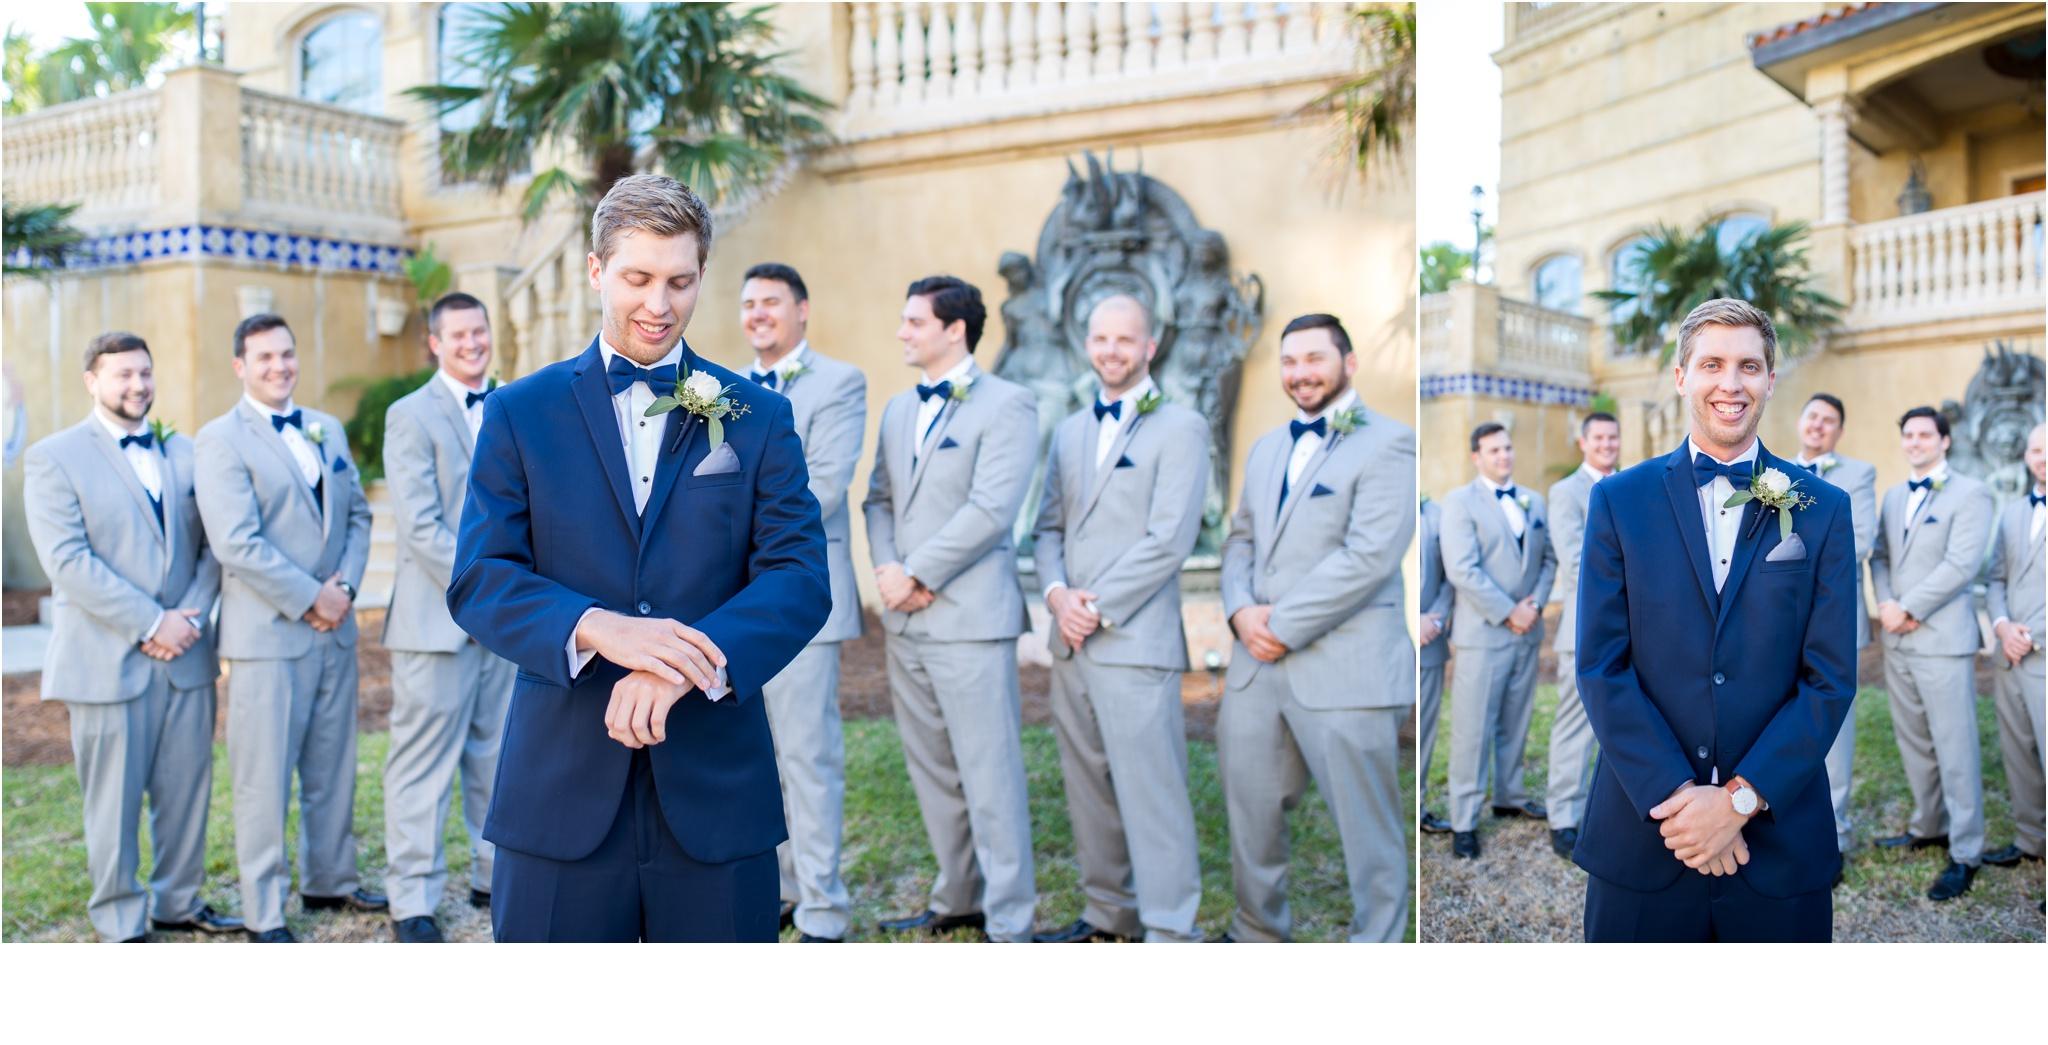 Rainey_Gregg_Photography_St._Simons_Island_Georgia_California_Wedding_Portrait_Photography_0664.jpg